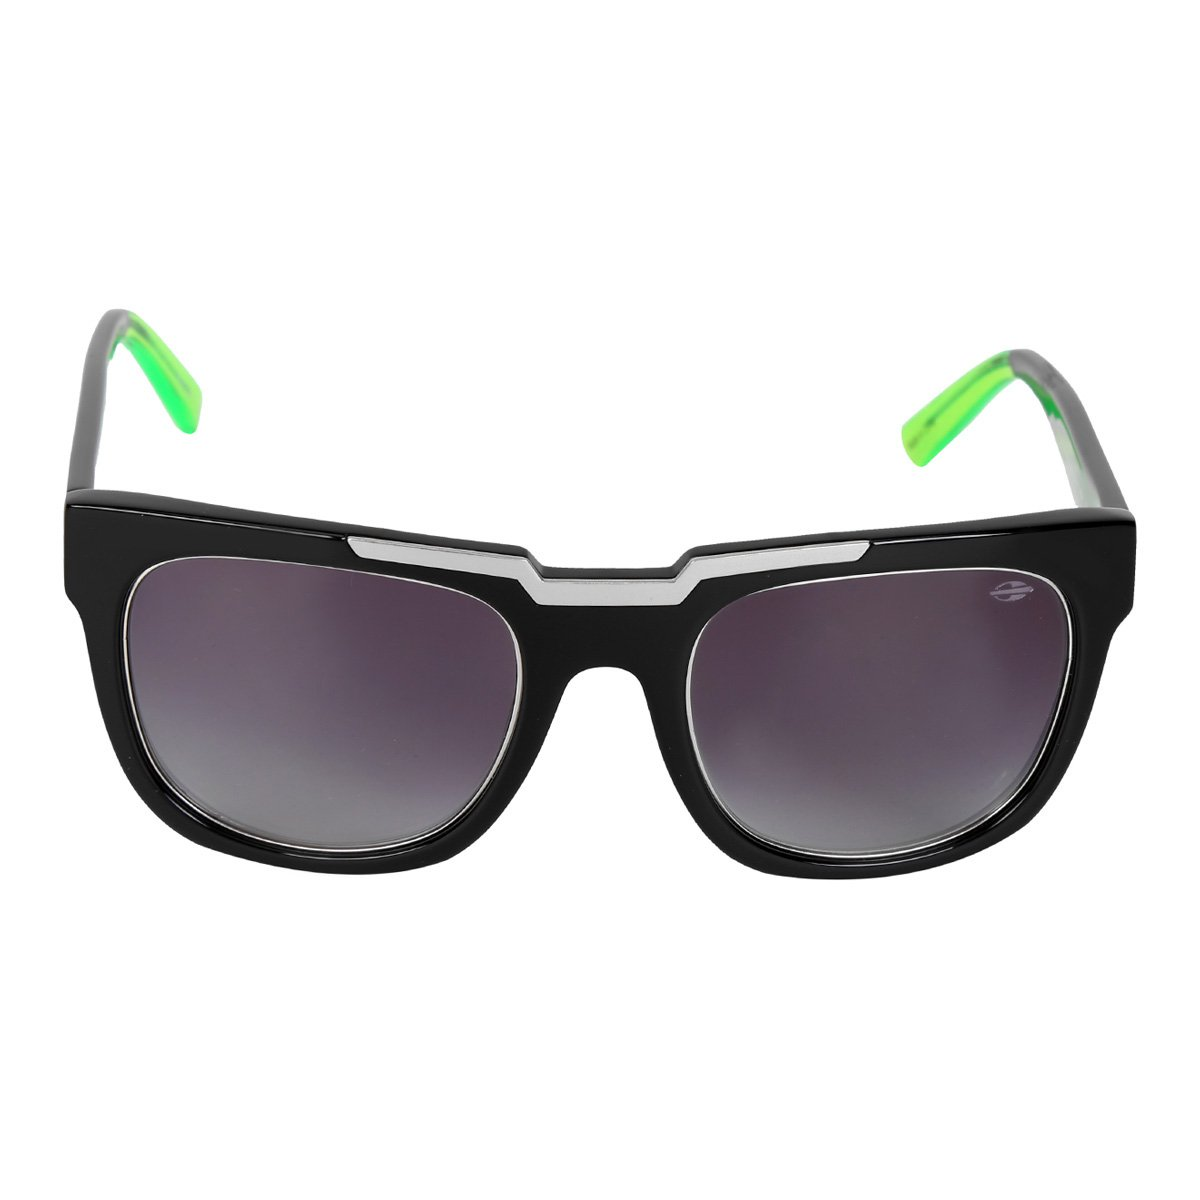 296781a6b0caf Óculos Sol Mormaii Aviador Masculino  Óculos Sol Mormaii Aviador Masculino  ...